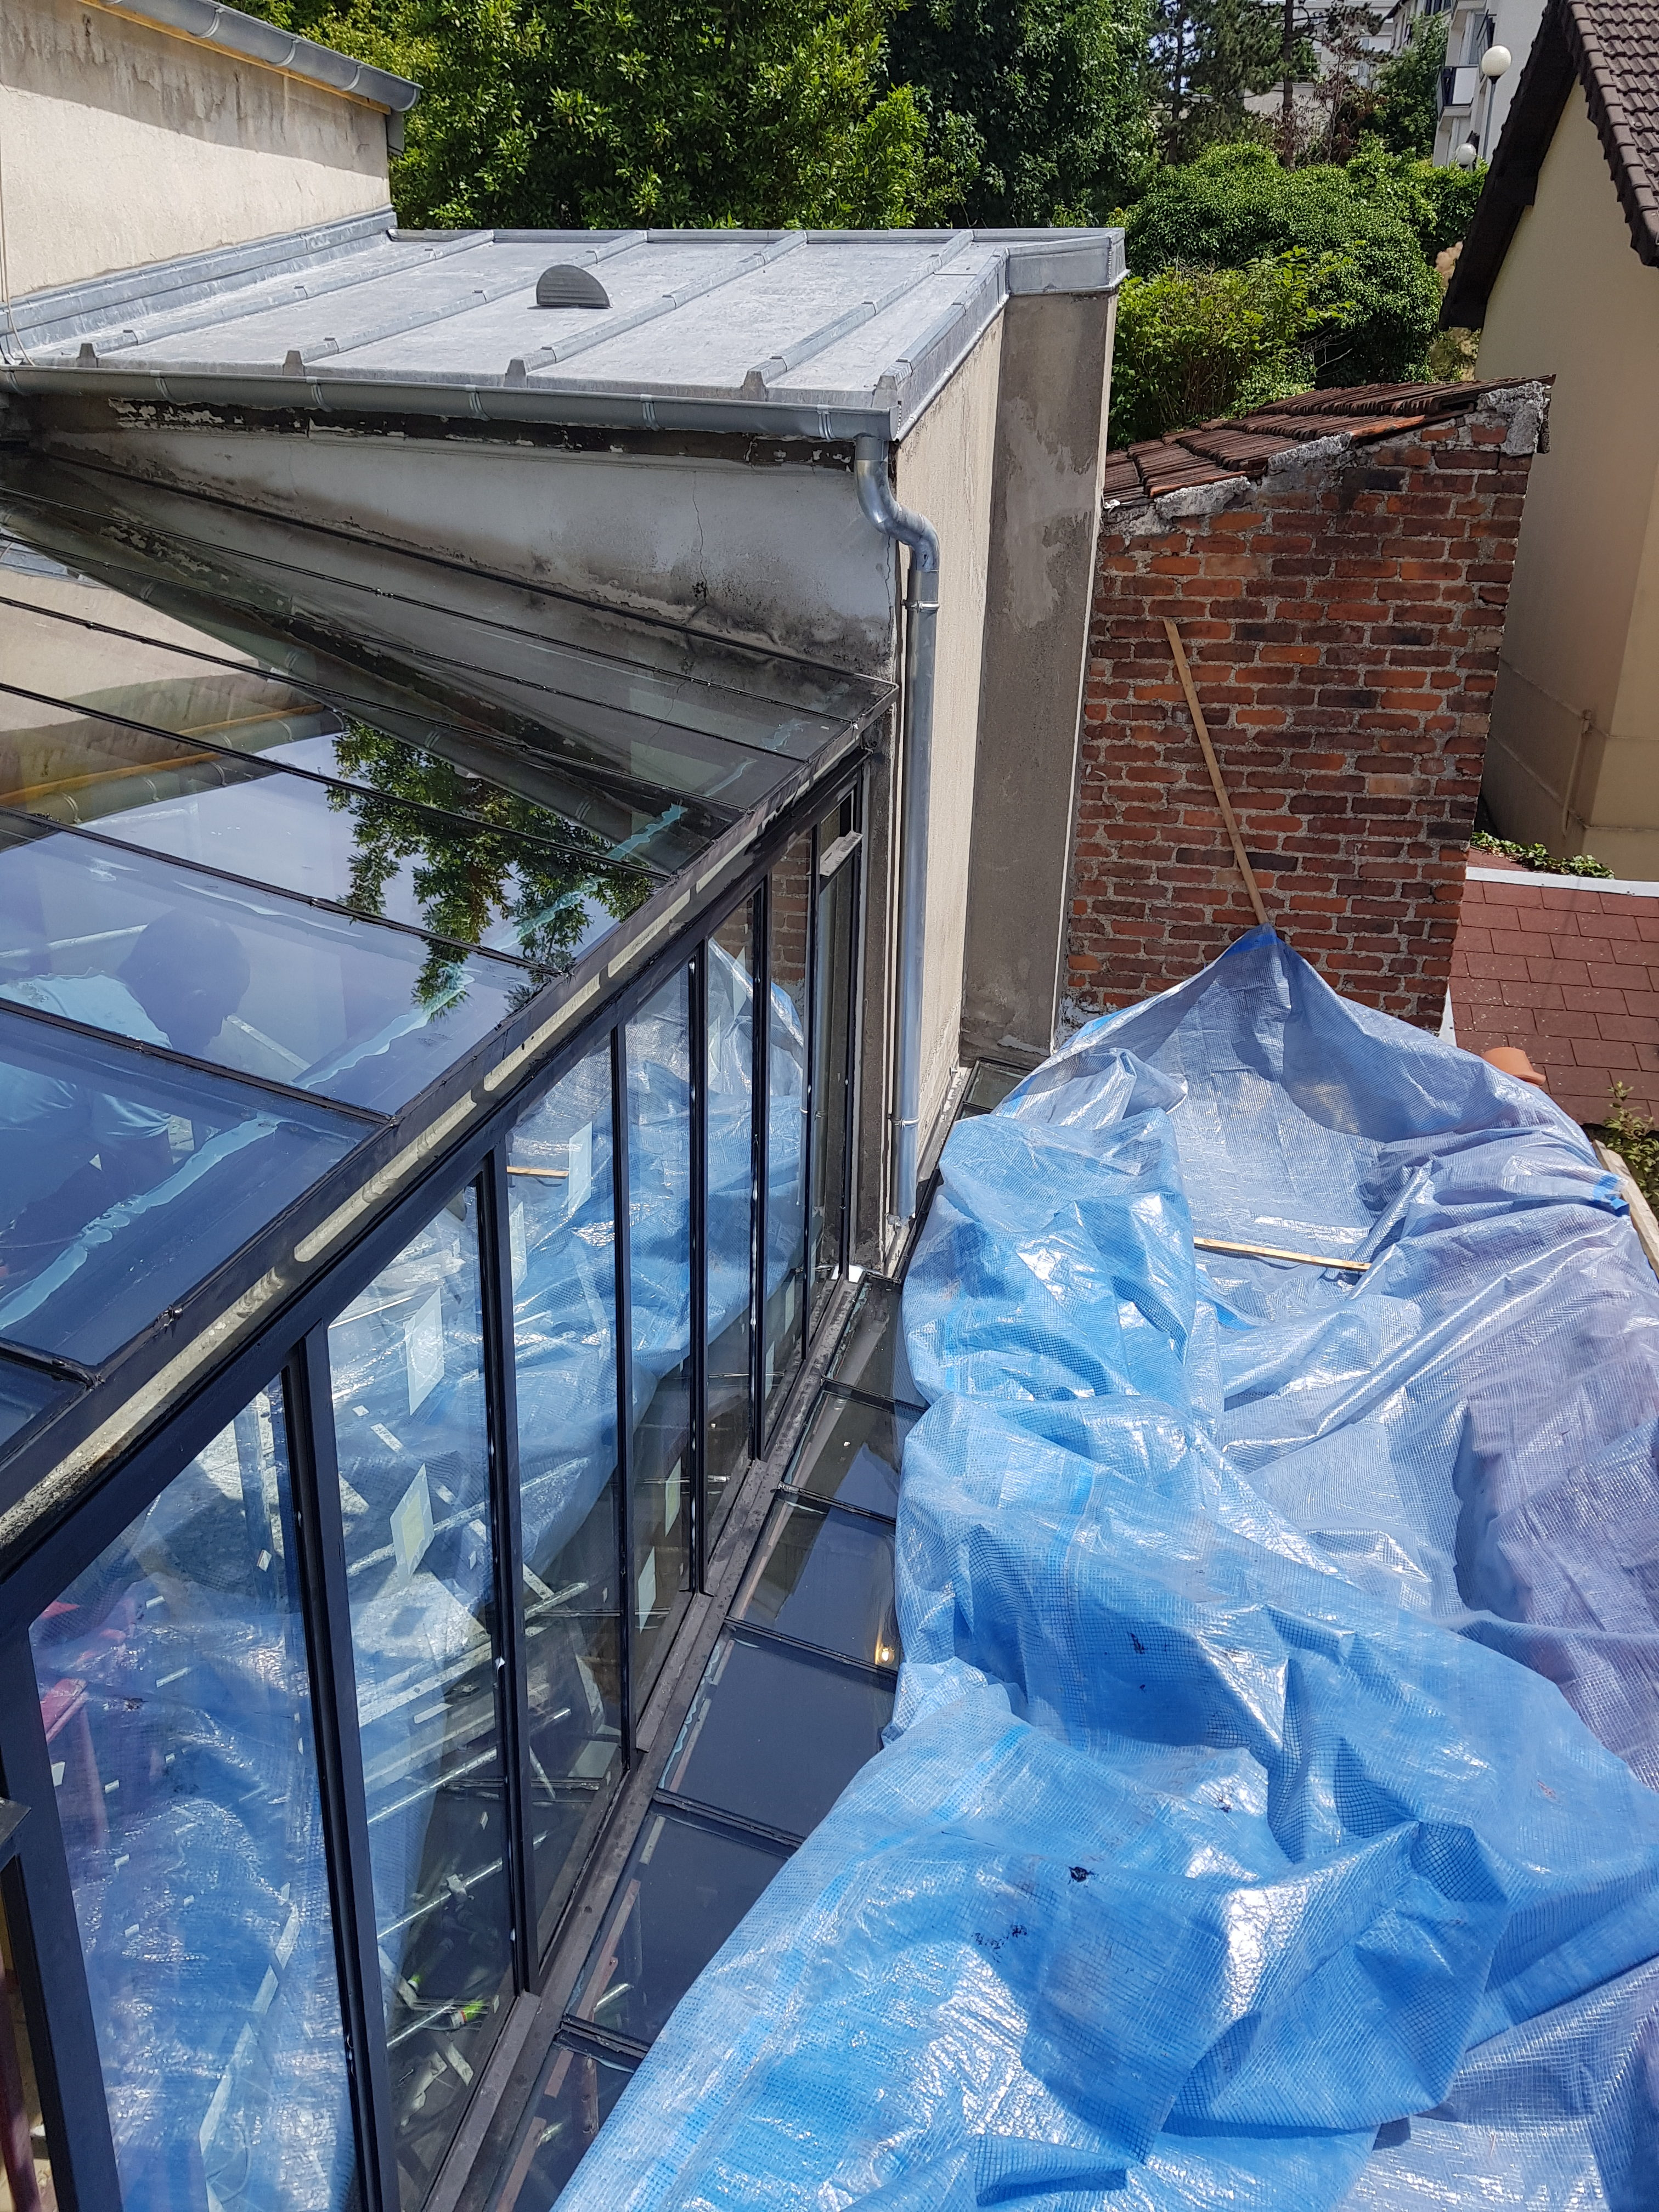 extension vitr e avec bh vitrier paris bh vitrier paris artisan vitrerie miroiterie. Black Bedroom Furniture Sets. Home Design Ideas